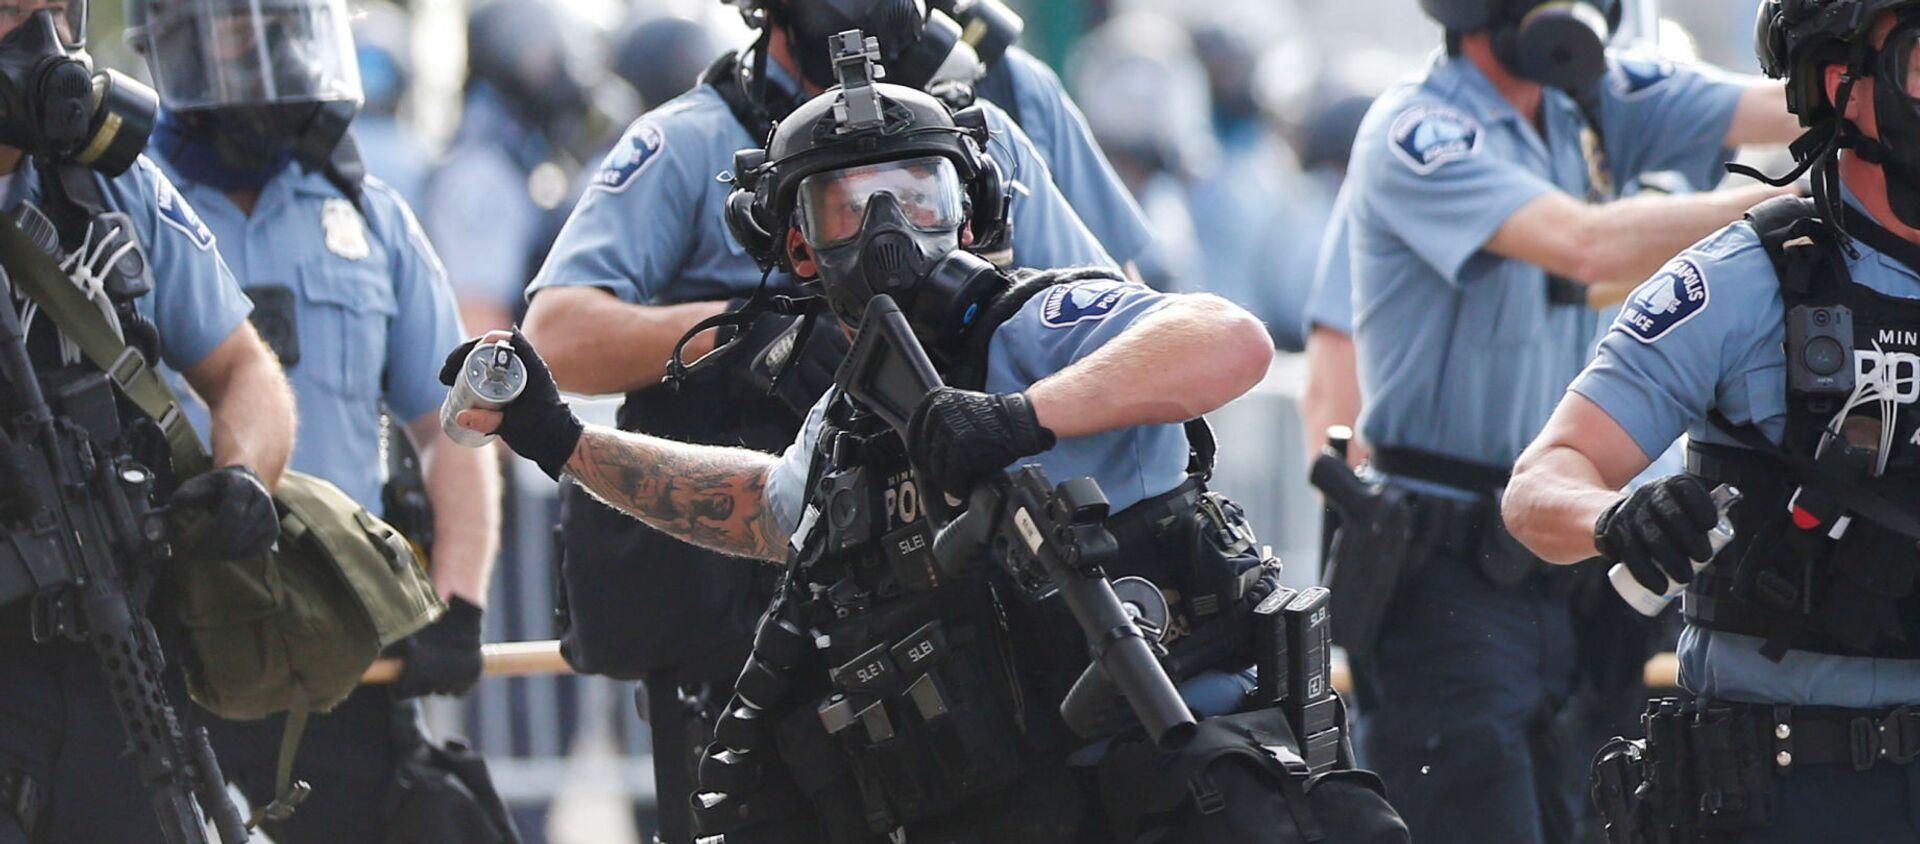 La Policía durante las protestas en Minneapolis  - Sputnik Mundo, 1920, 29.05.2020